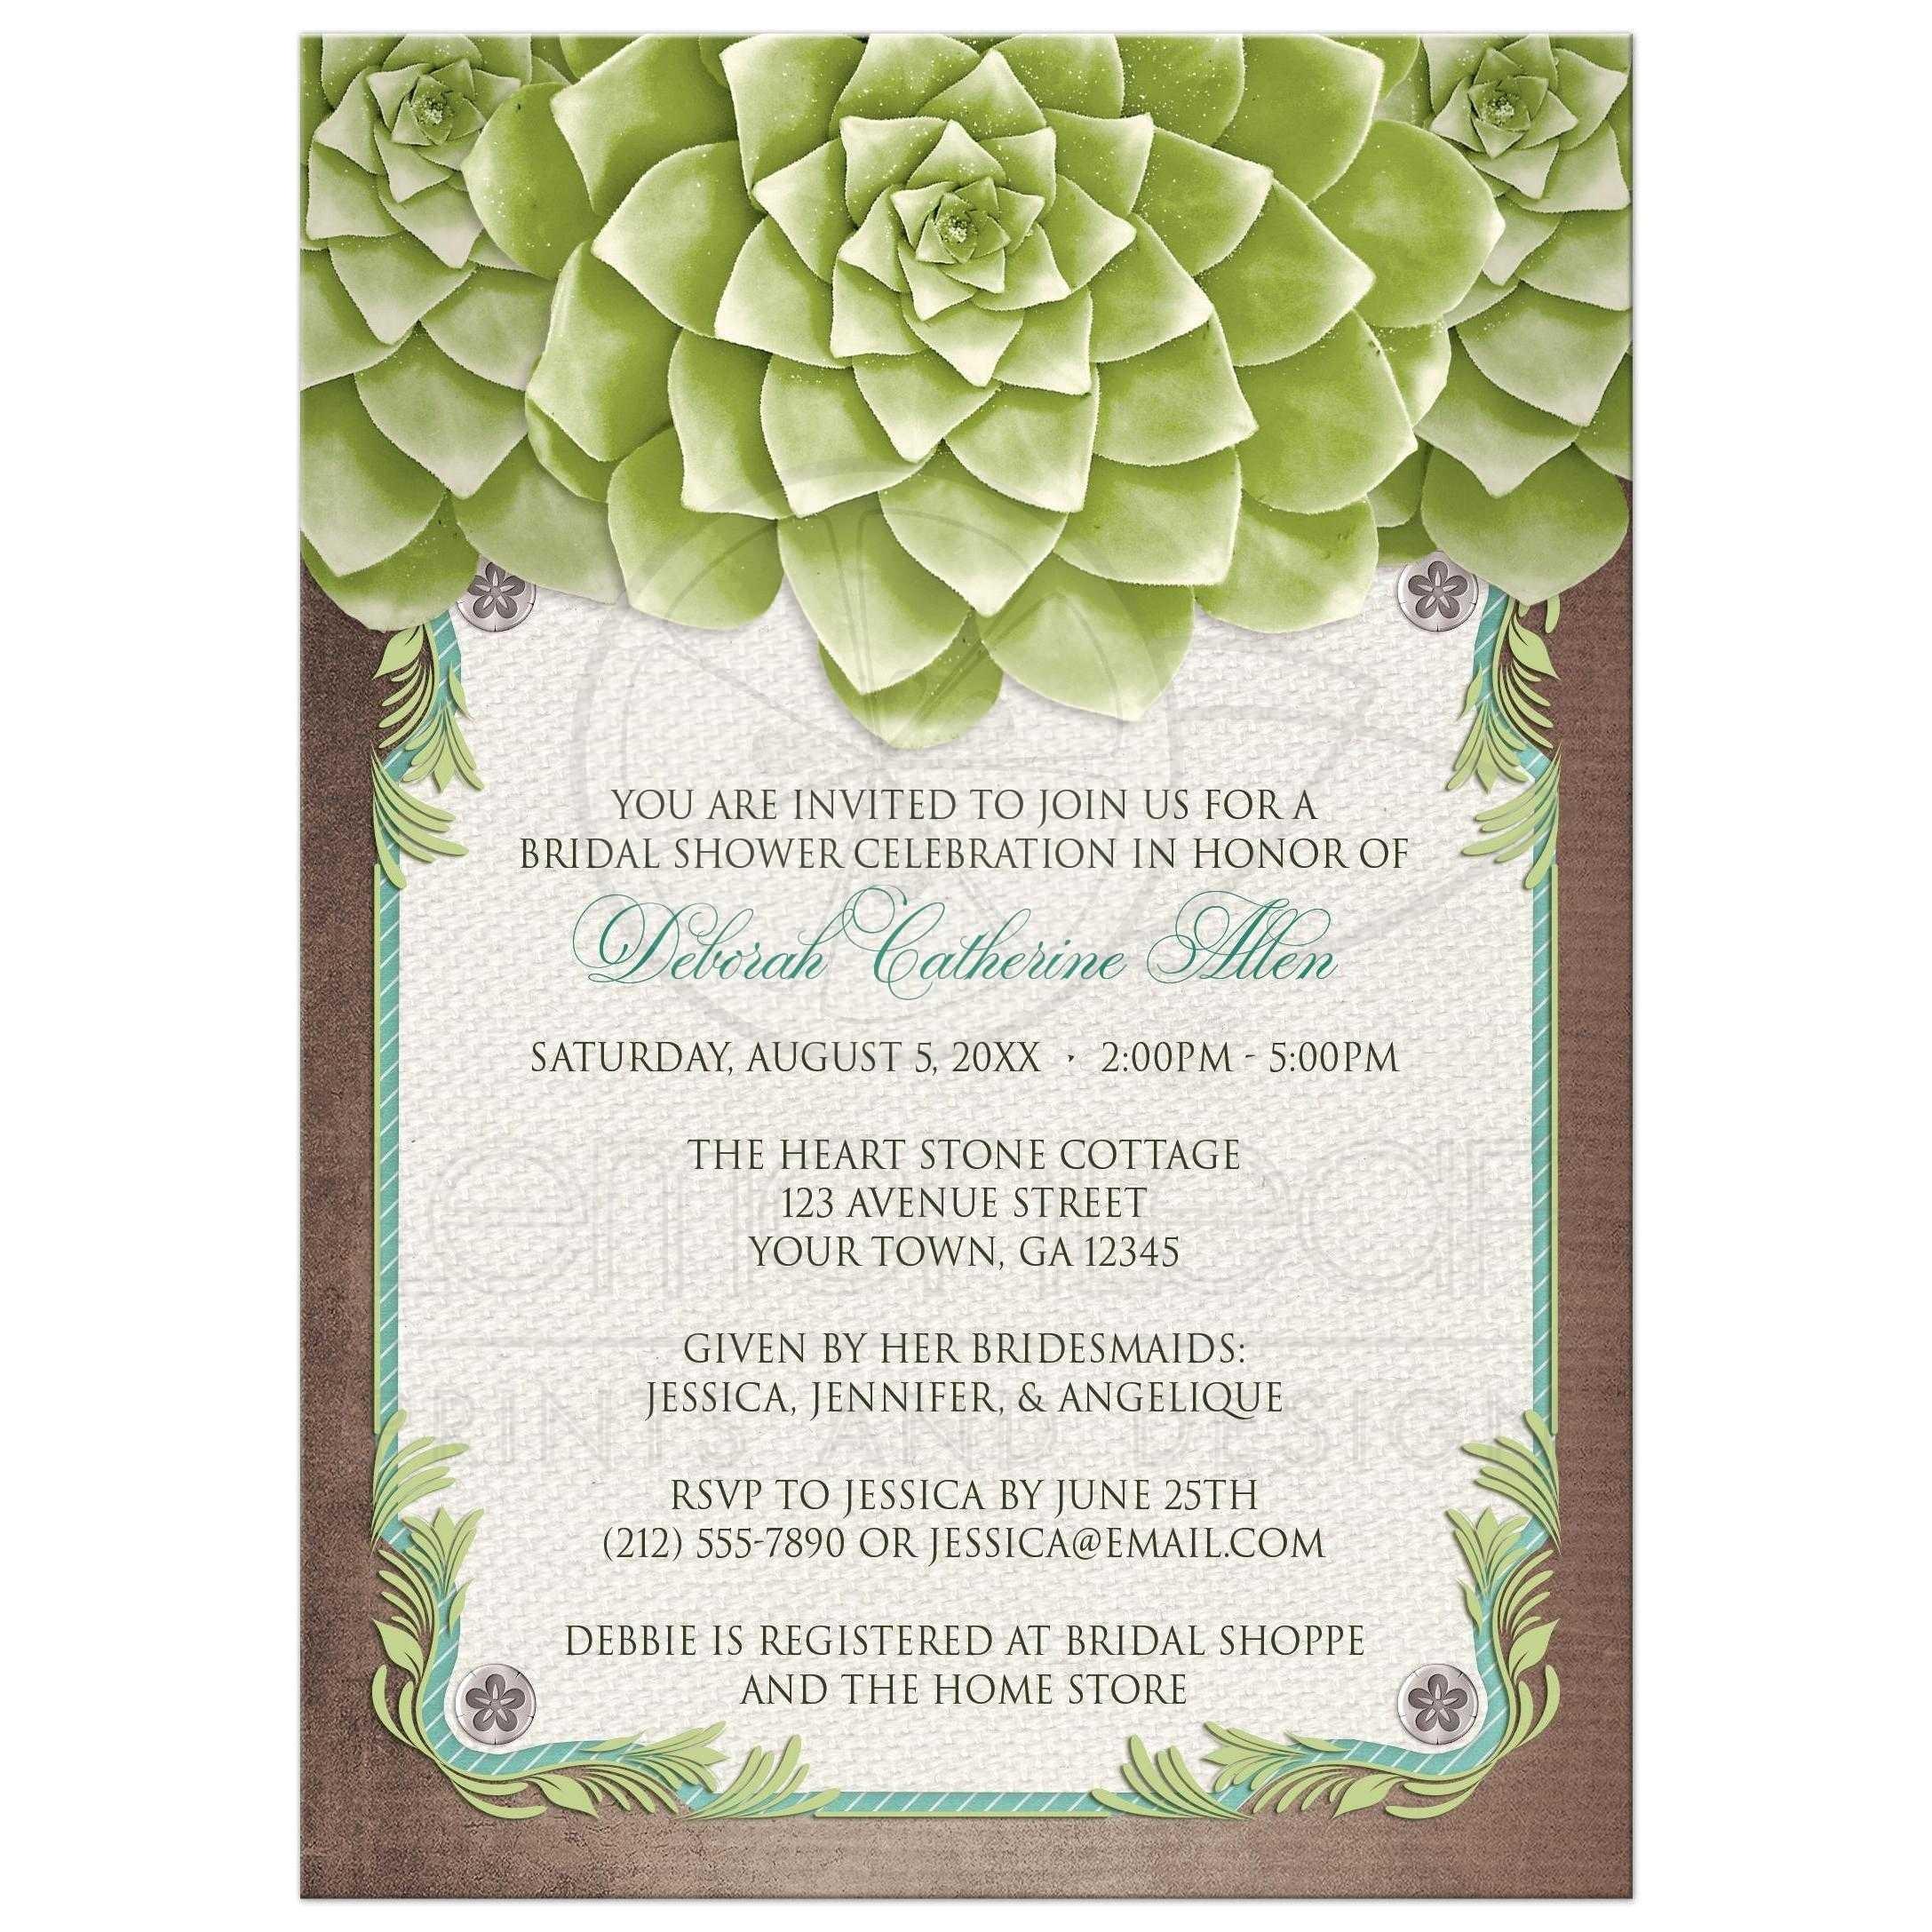 bridal shower invitations rustic succulent garden